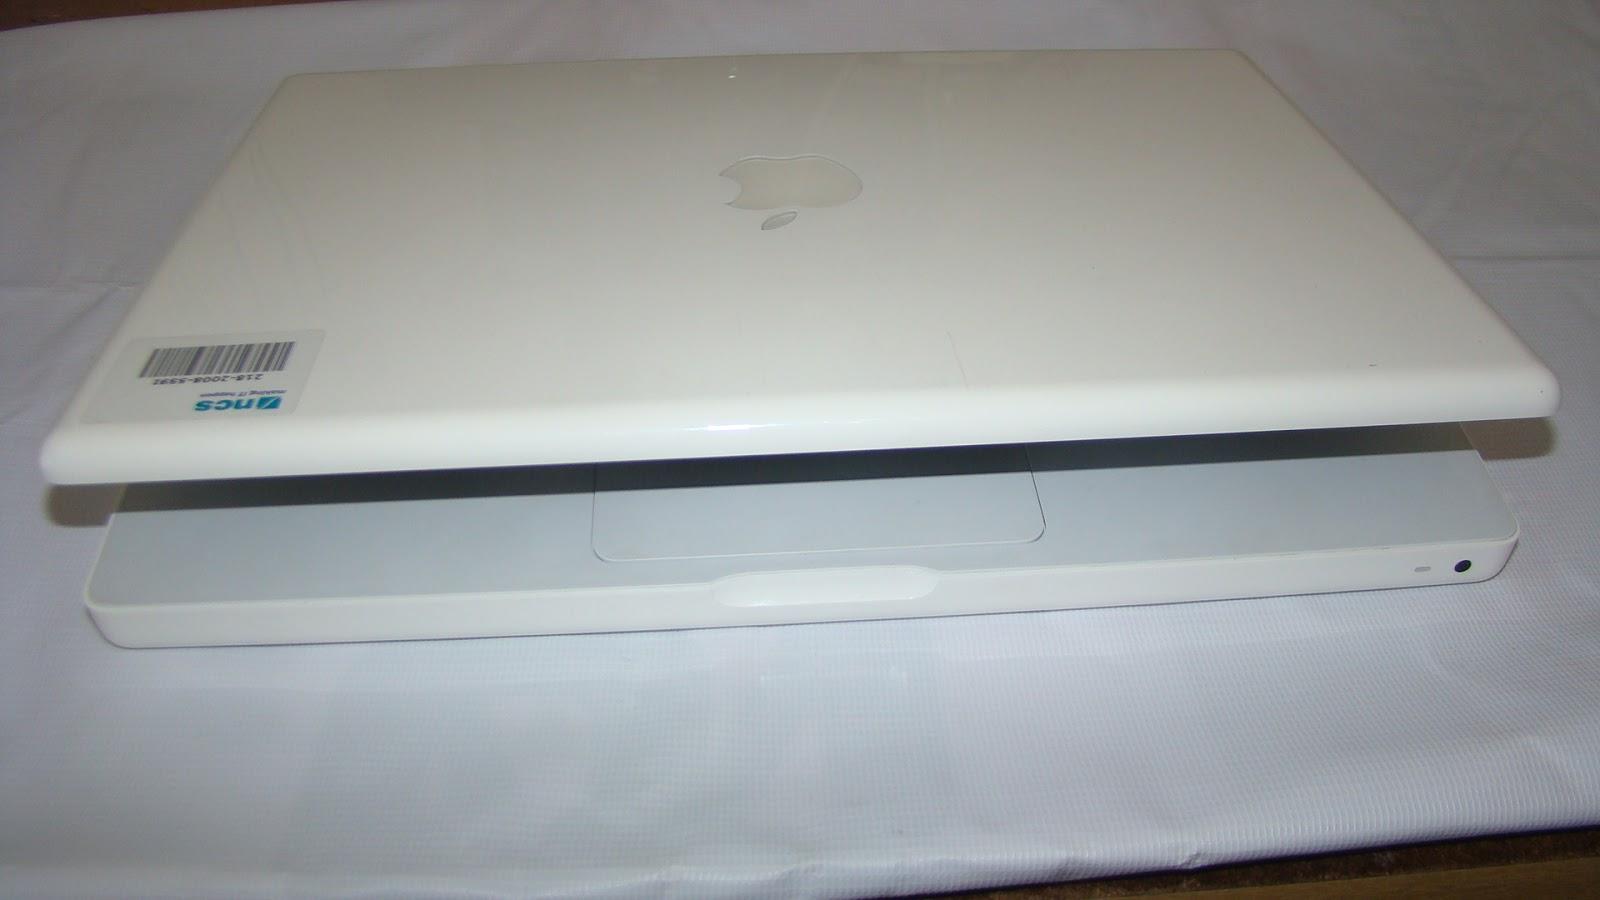 Semarang: MacBook white 2.1 - A1181 - Core 2Duo - Mulus-Semarang